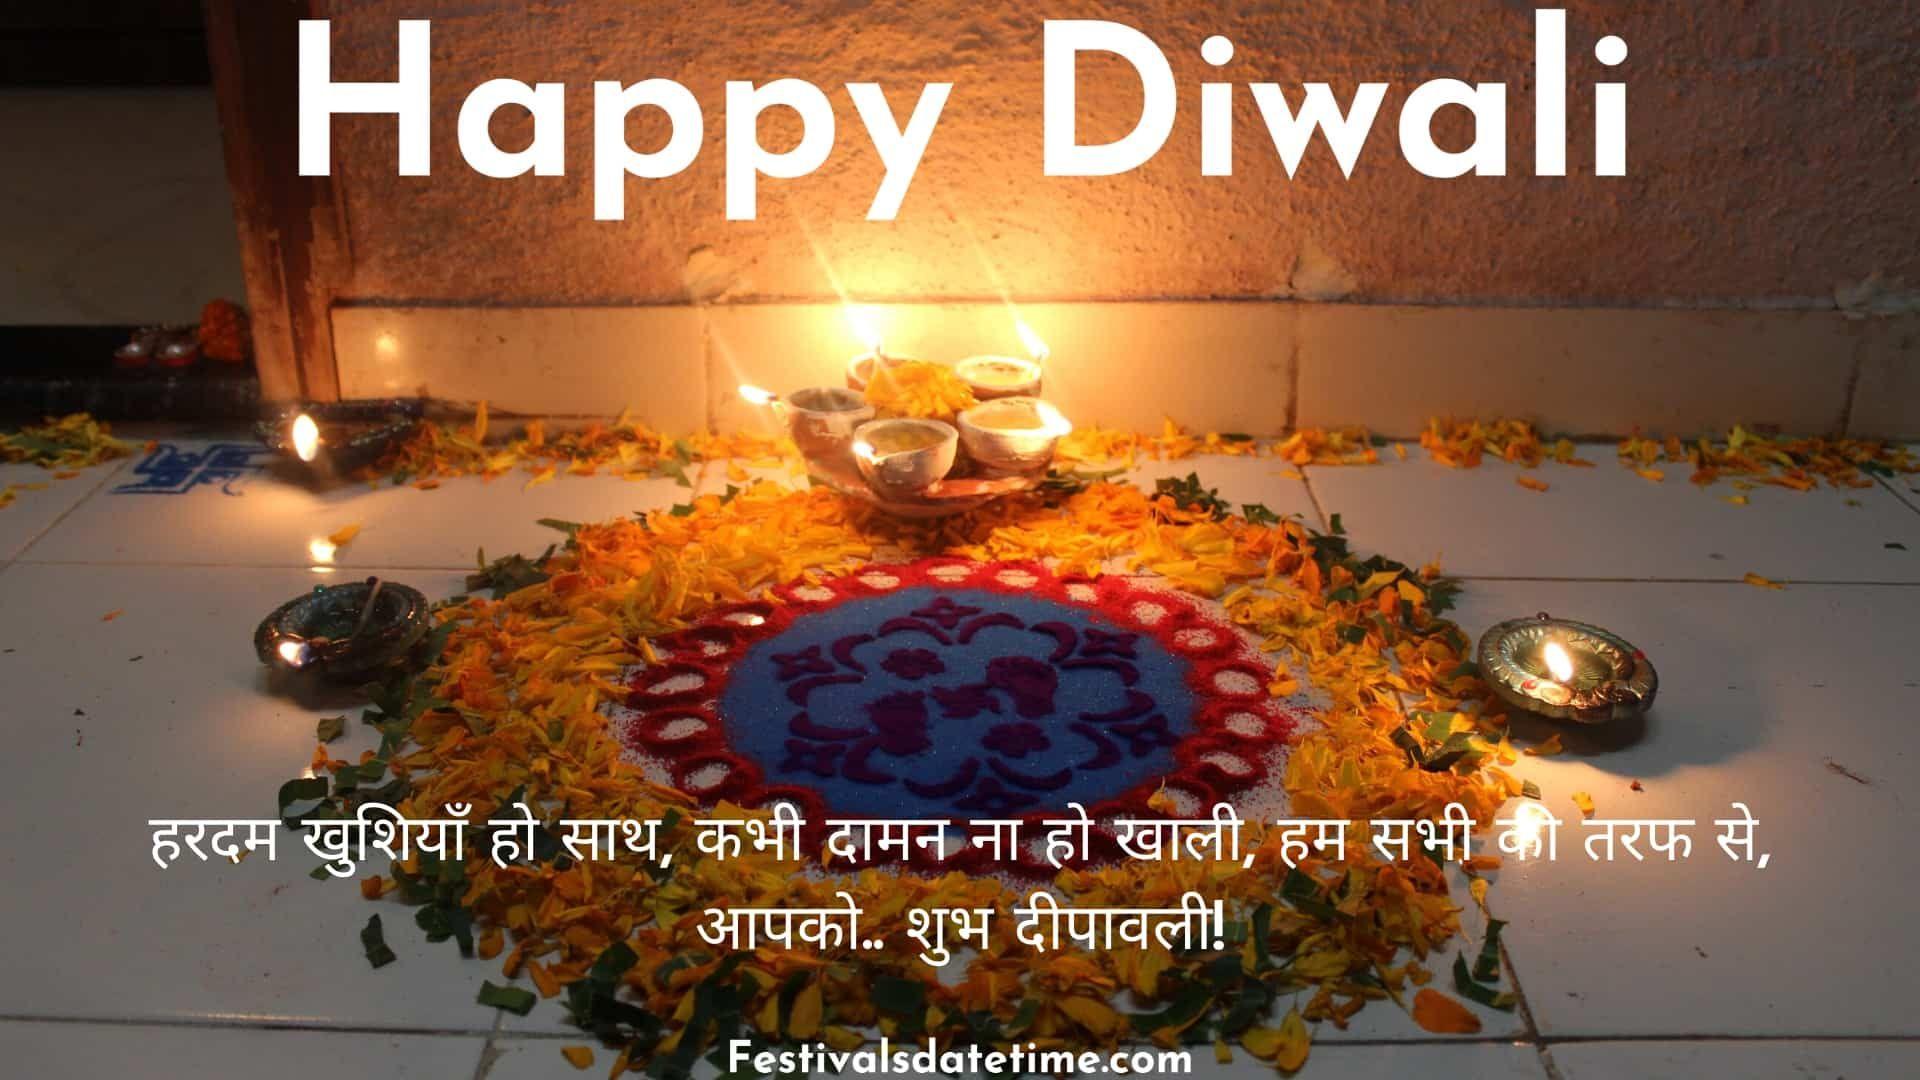 Diwali 2020 Whatsapp Status Download in 2020 Diwali